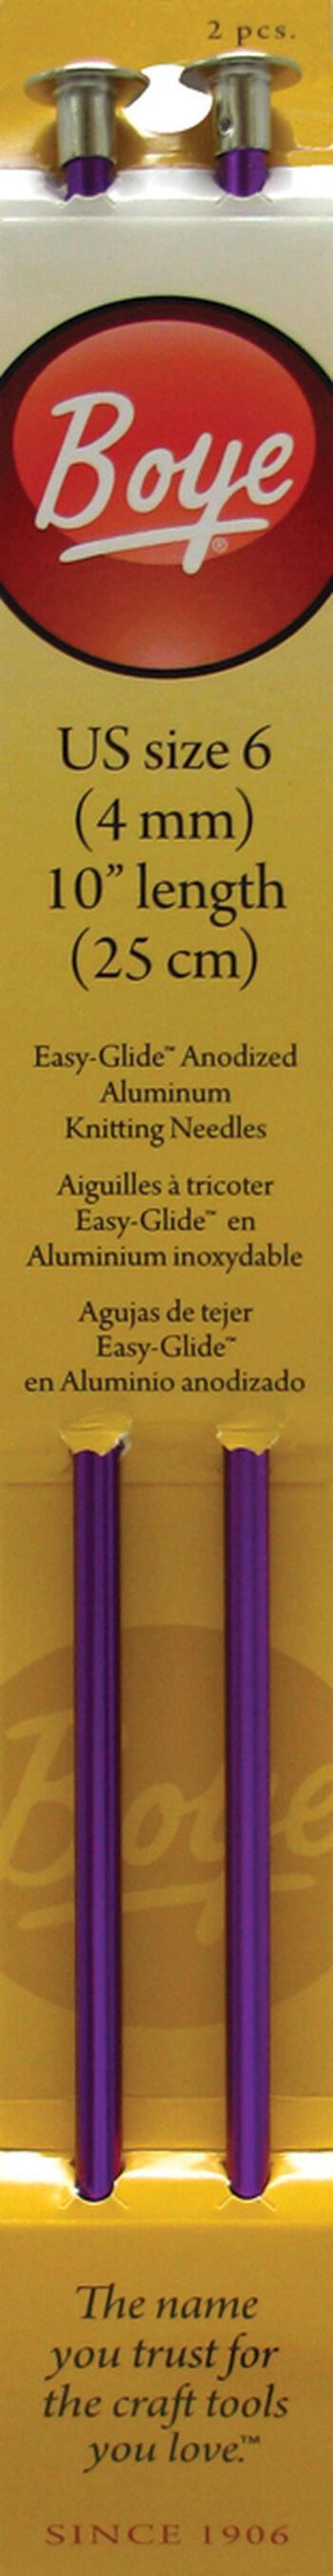 "Single Point Aluminum Knitting Needles 10""-Size 6/4mm"